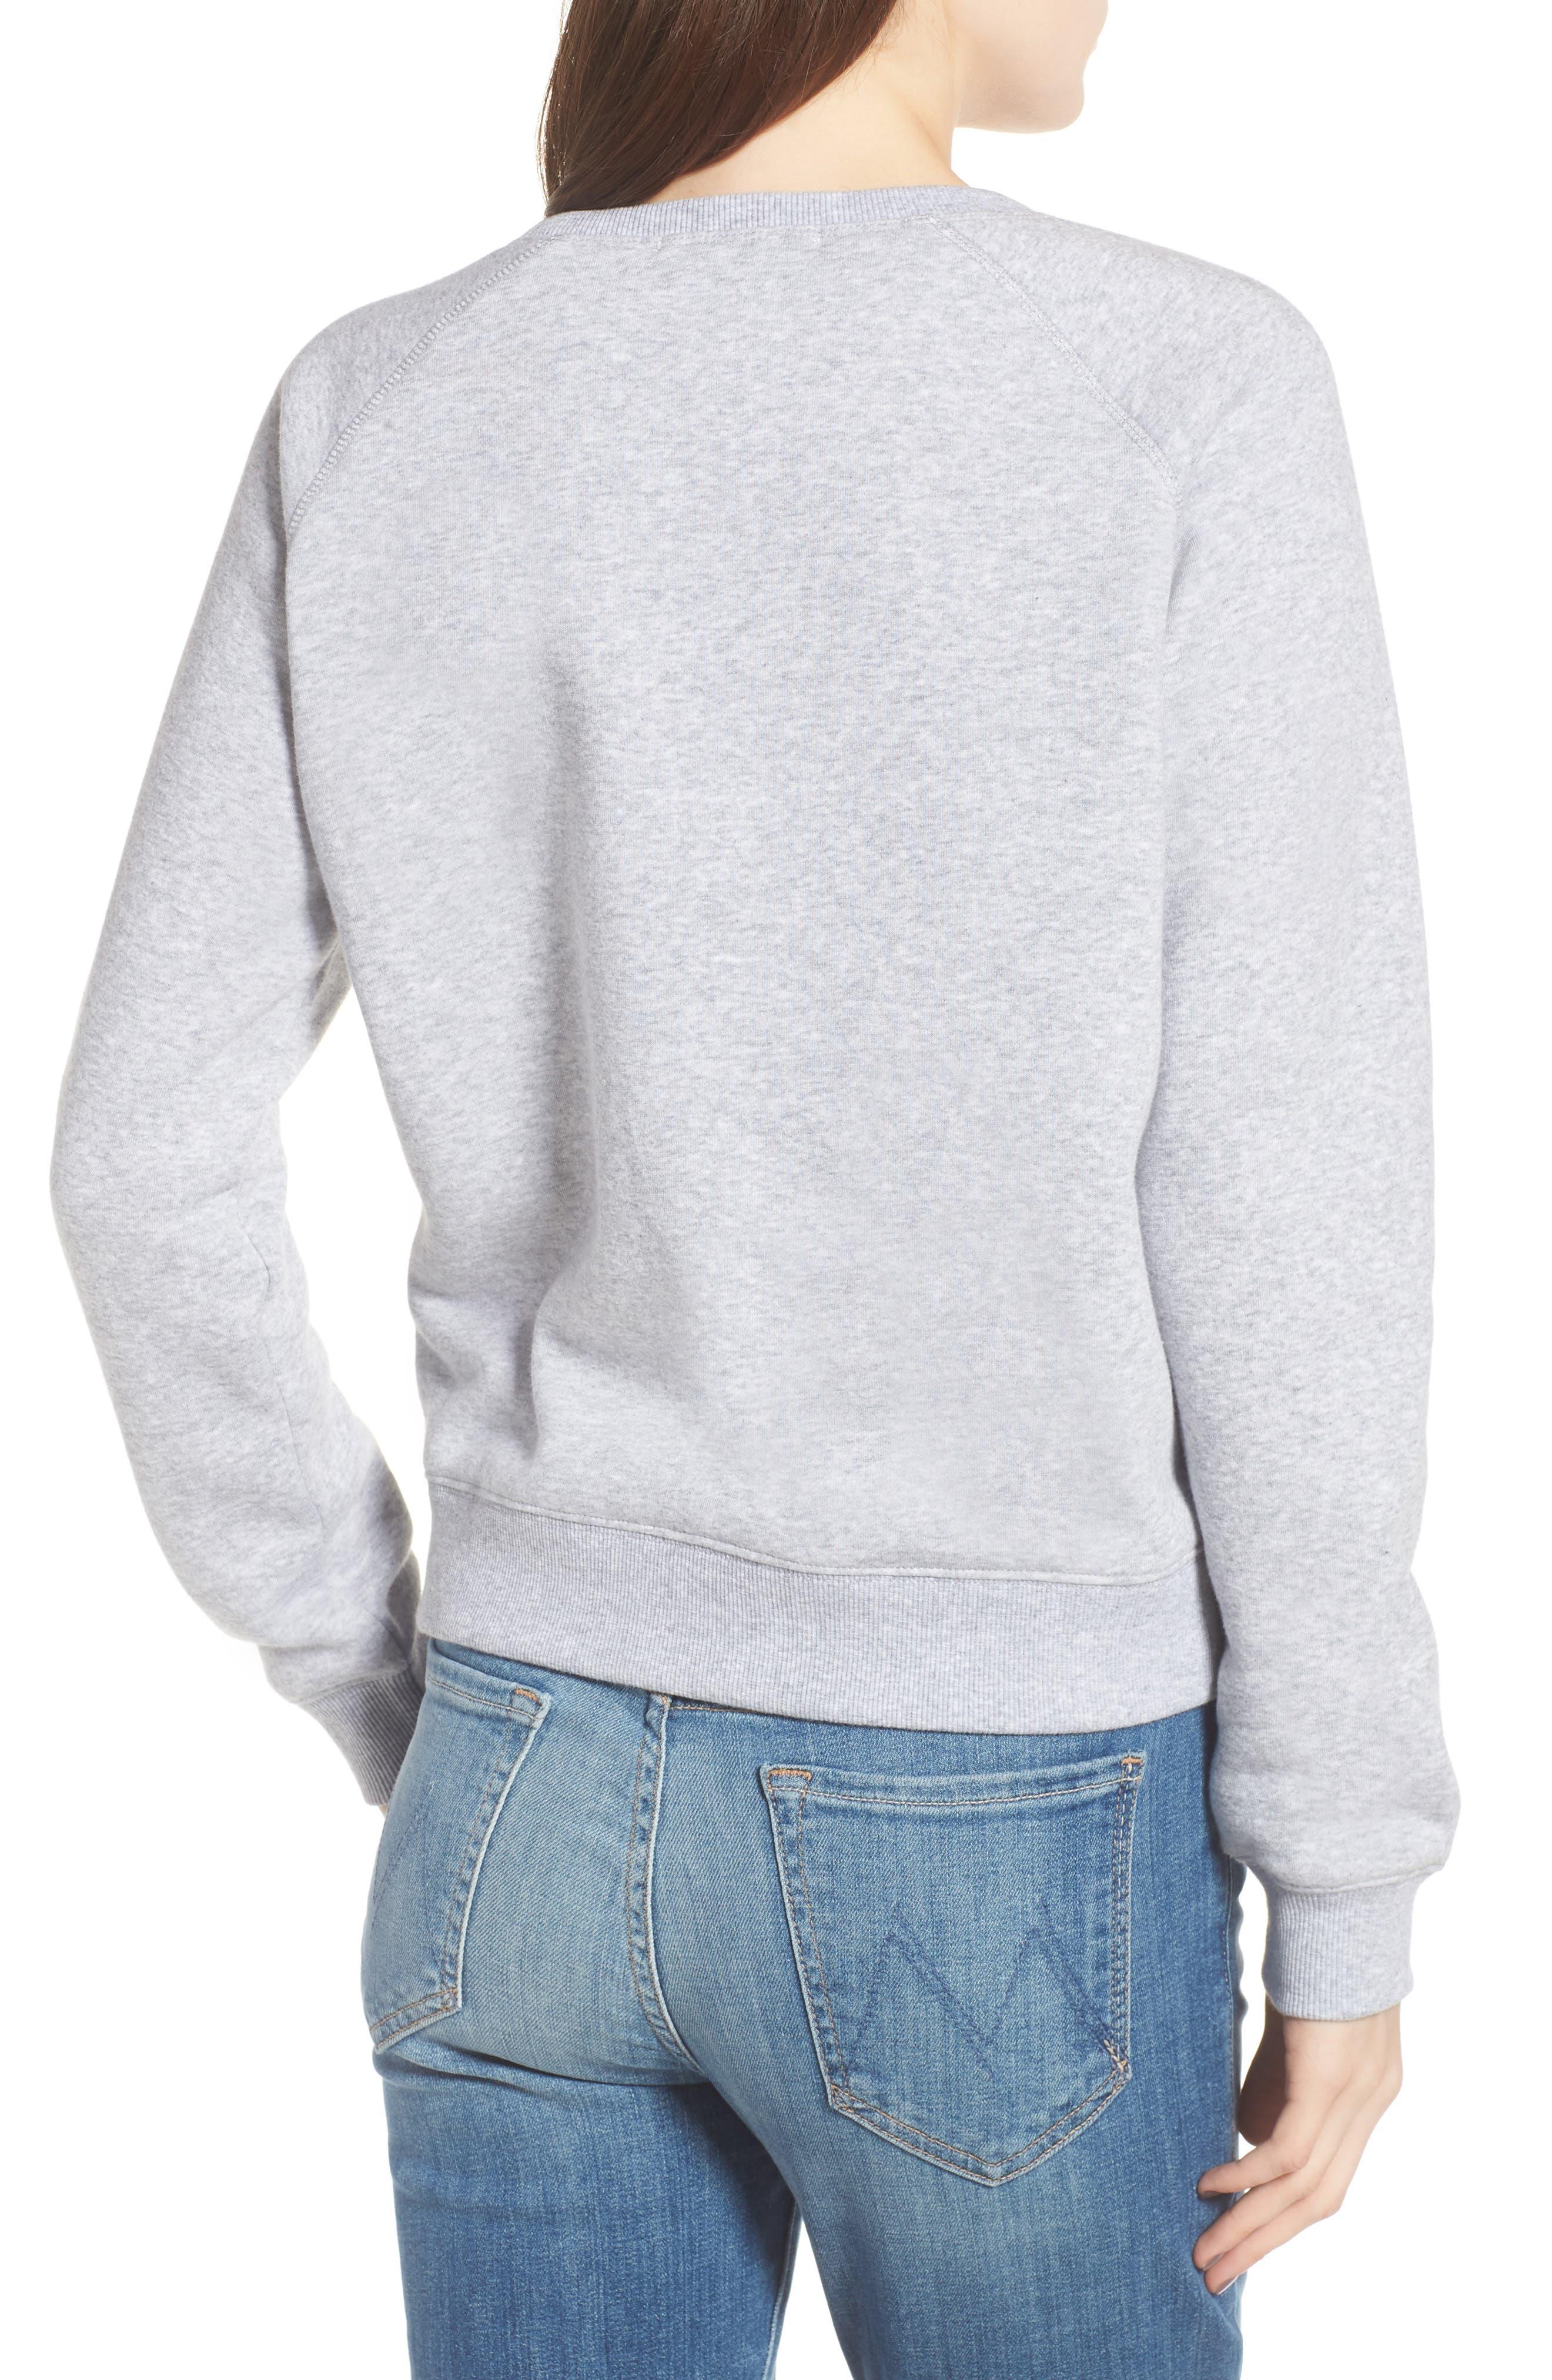 Off Duty Sweatshirt,                             Alternate thumbnail 2, color,                             026